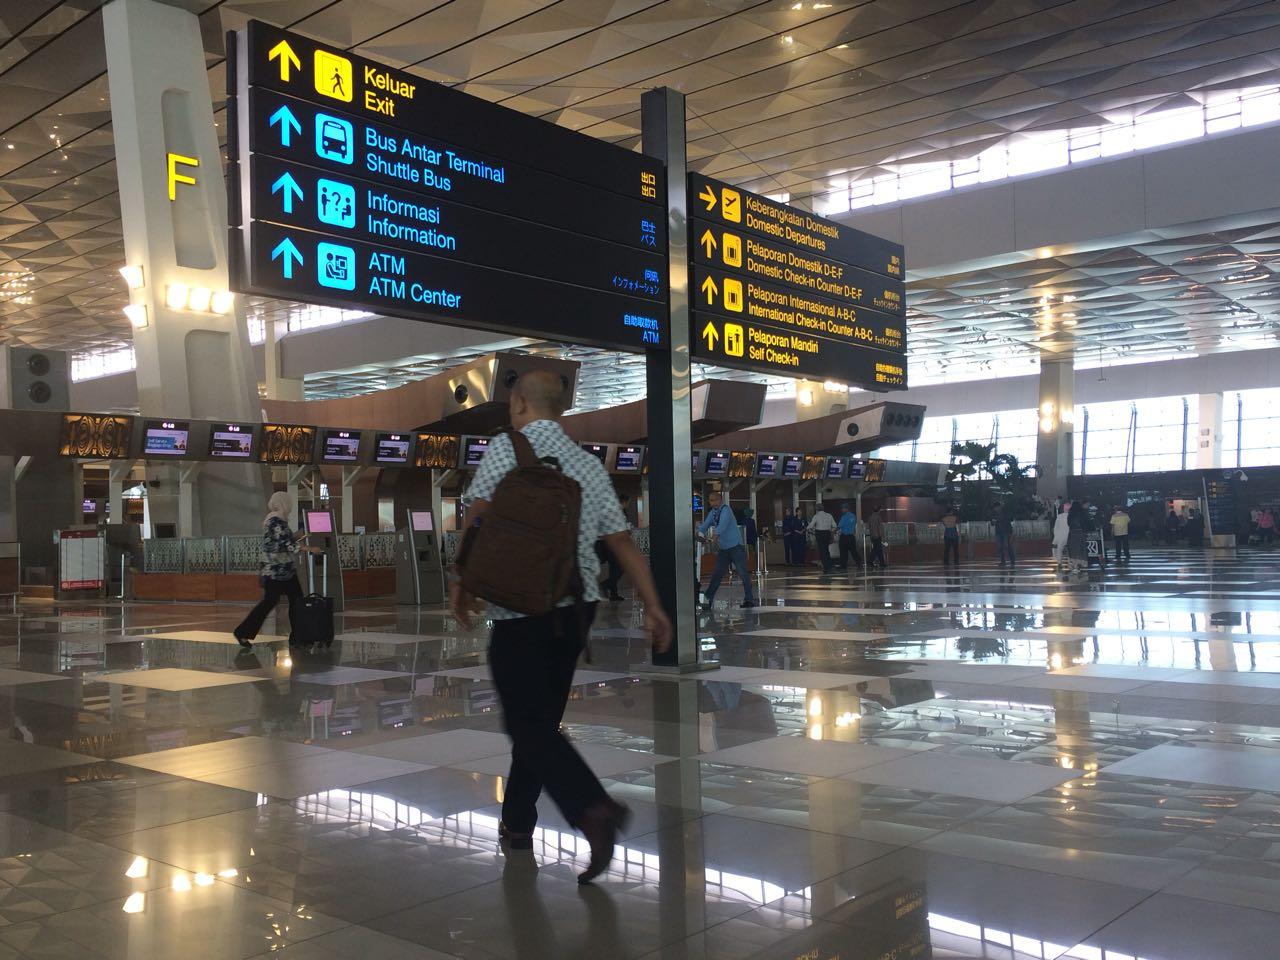 https: img.okezone.com content 2021 05 30 320 2417464 penumpang-bandara-juanda-naik-16-pasca-larangan-mudik-wkhyJ4NjoG.jpg